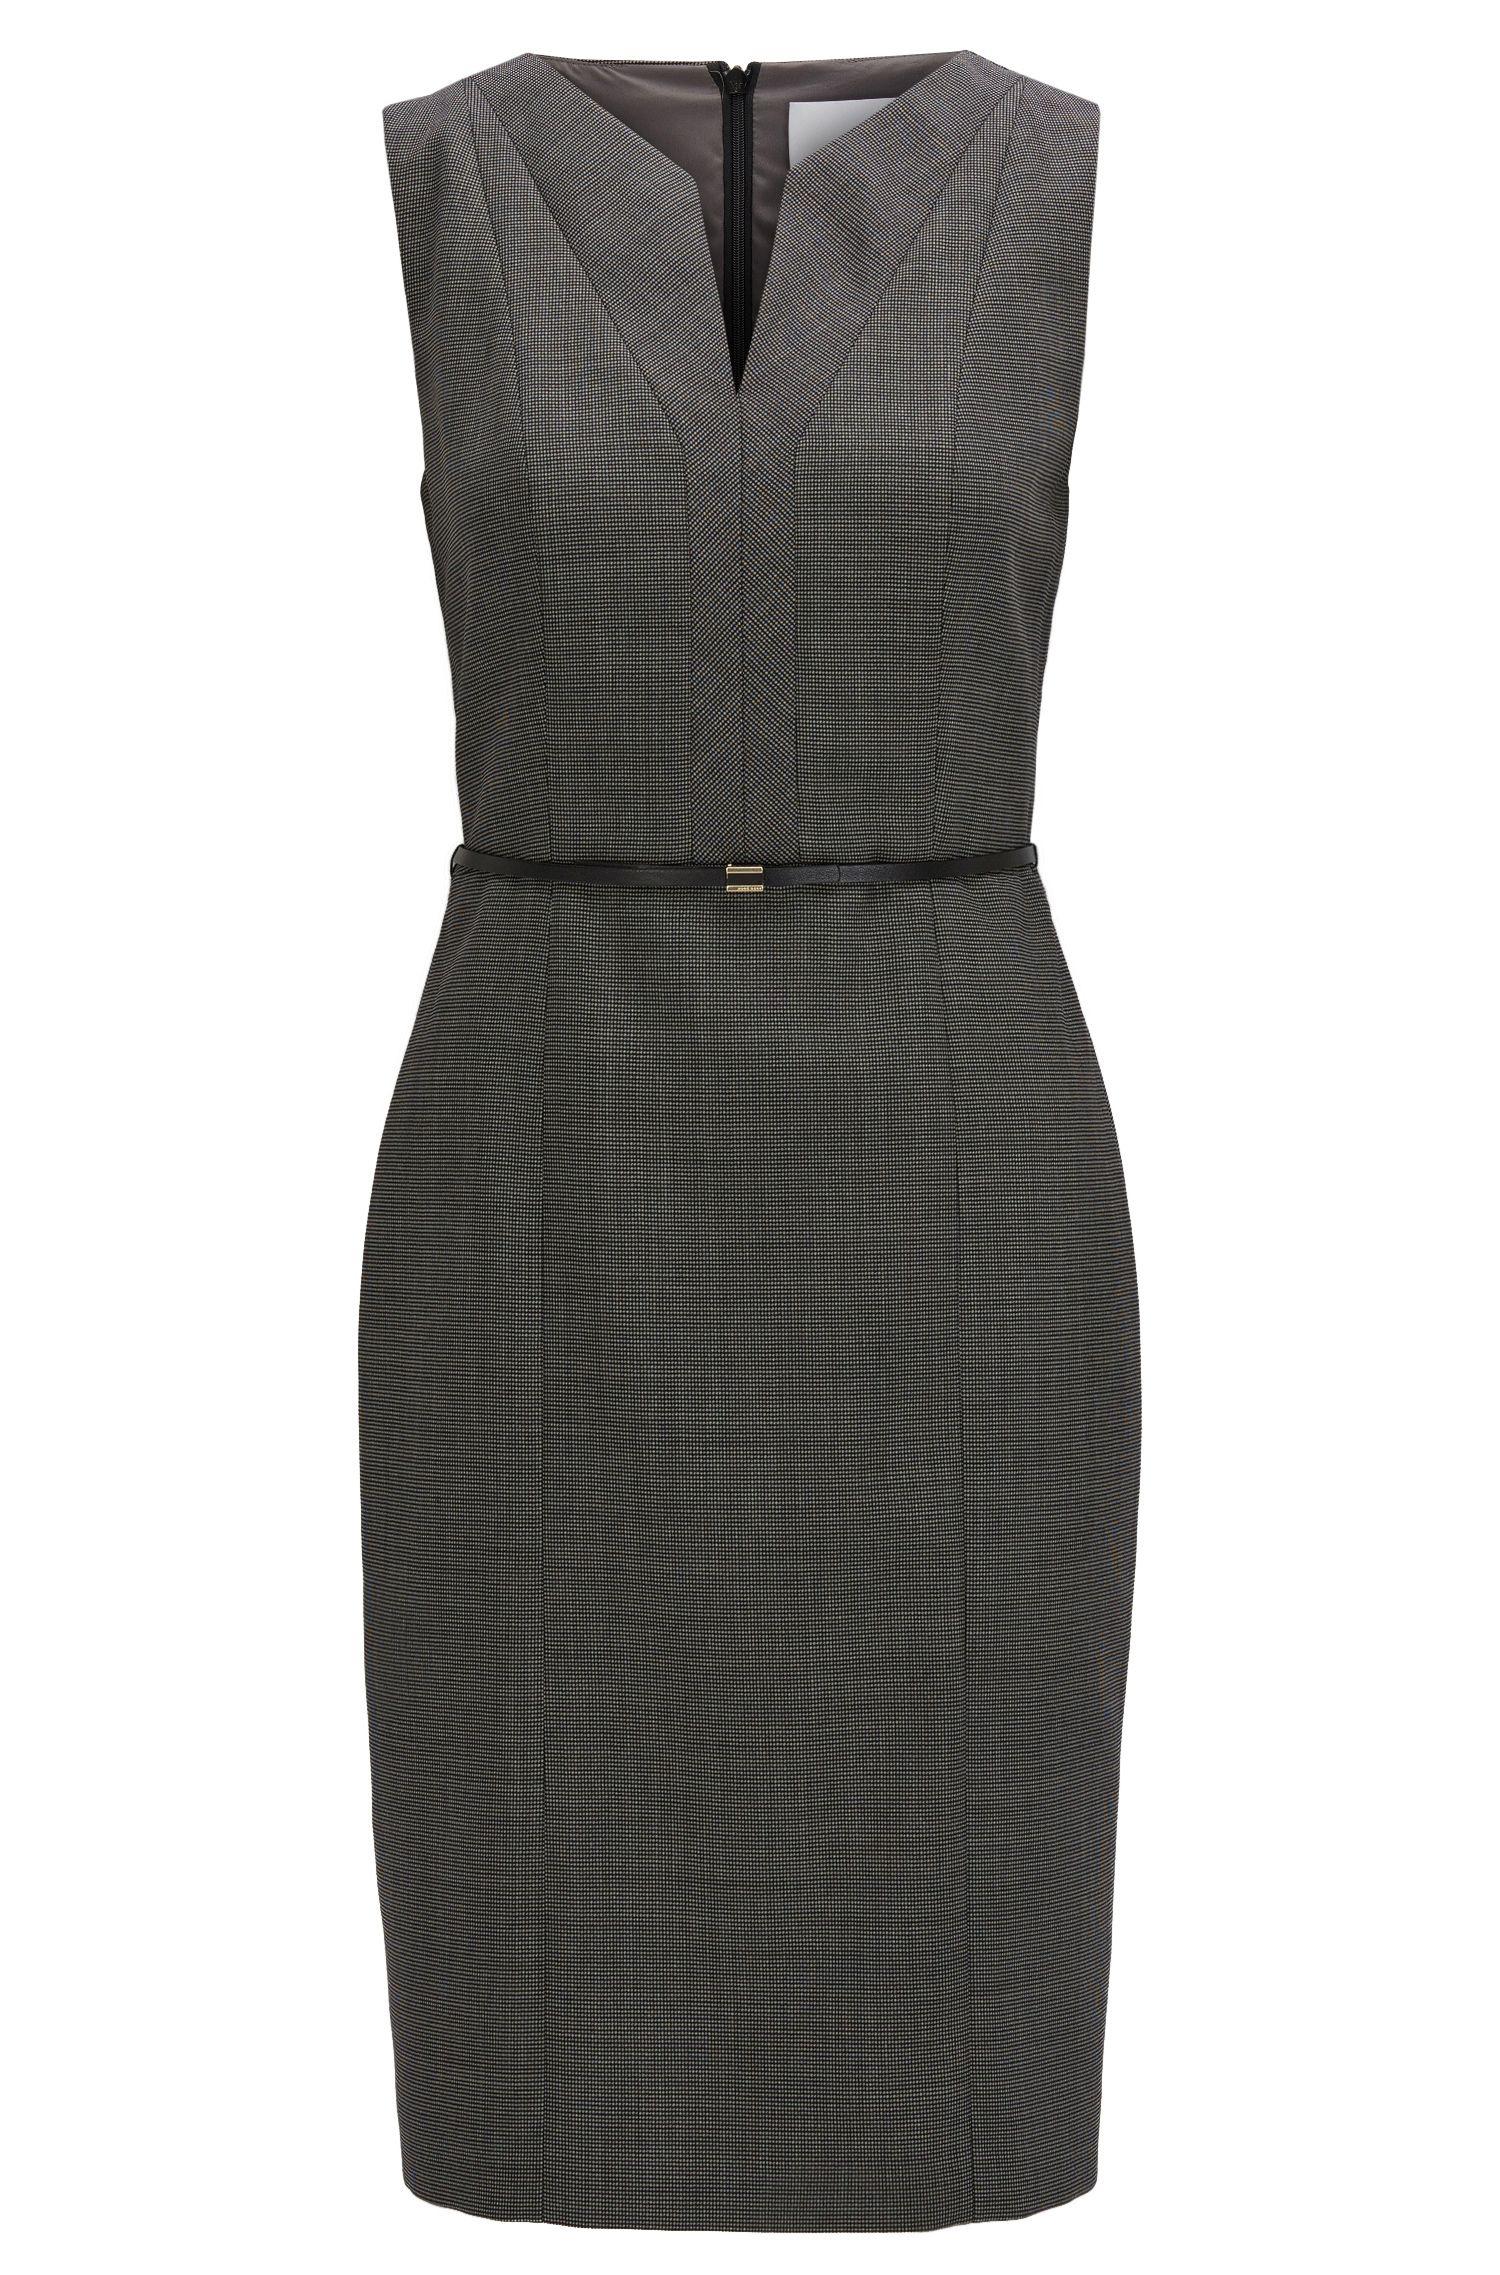 Regular-fit shift dress in stretch virgin wool